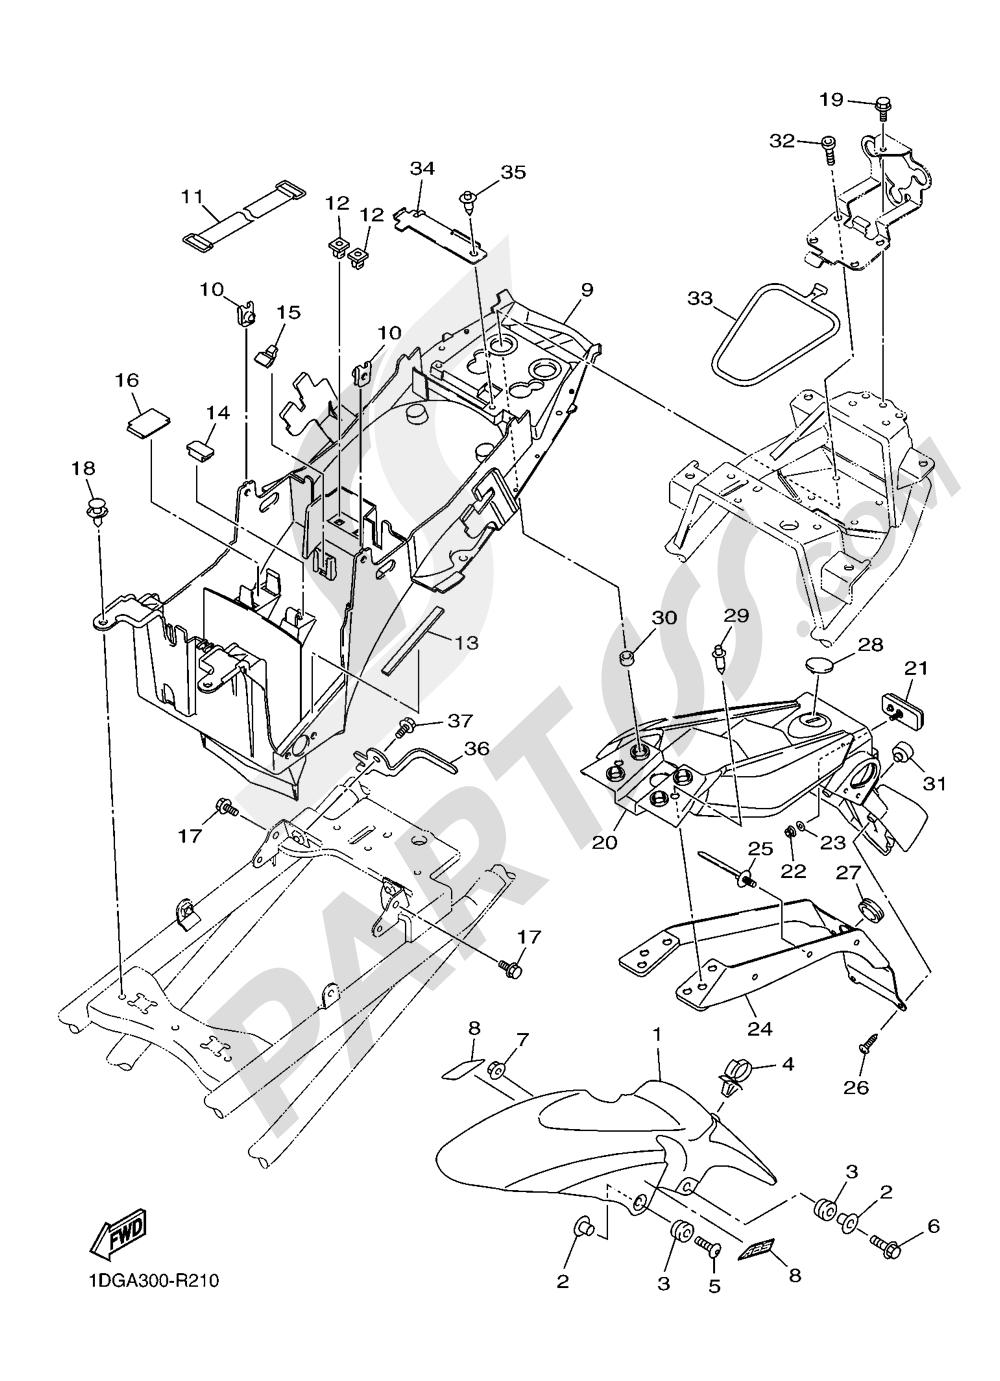 FENDER Yamaha XJ6 Diversion F ABS 2016